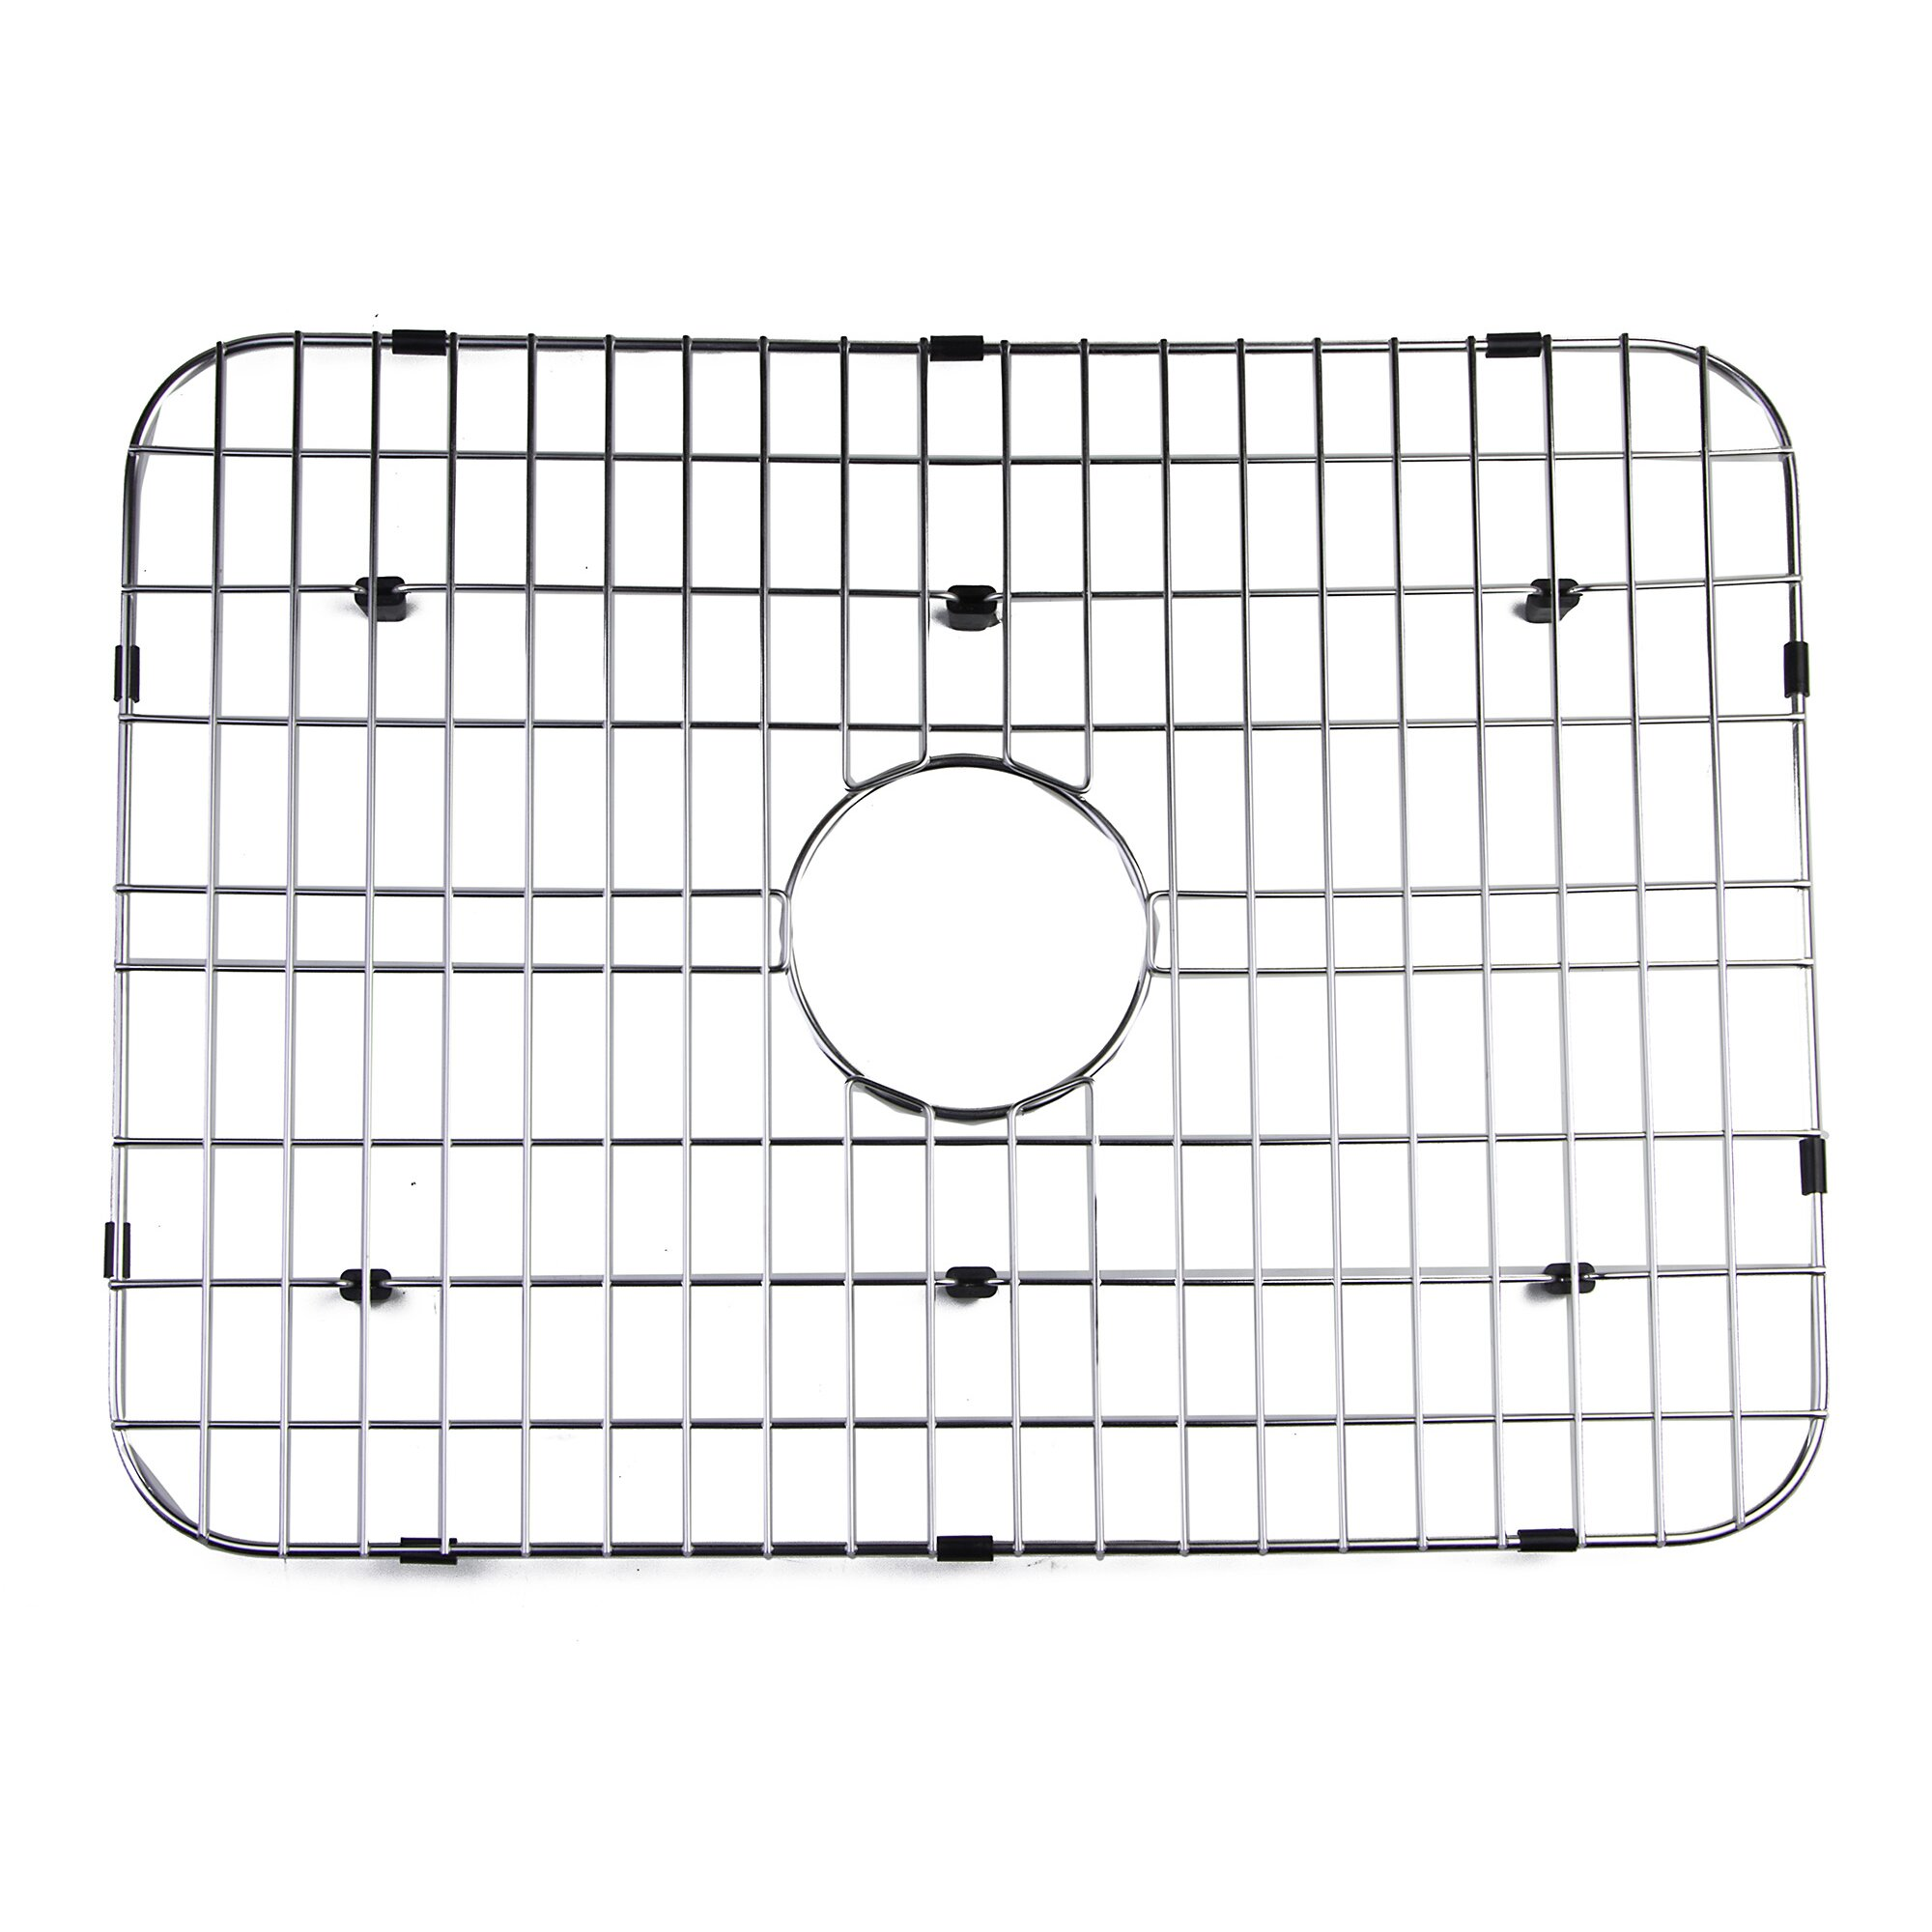 Kitchen Sink Grids kitchen bottom grid sink protectors native trails. gr972 bottom